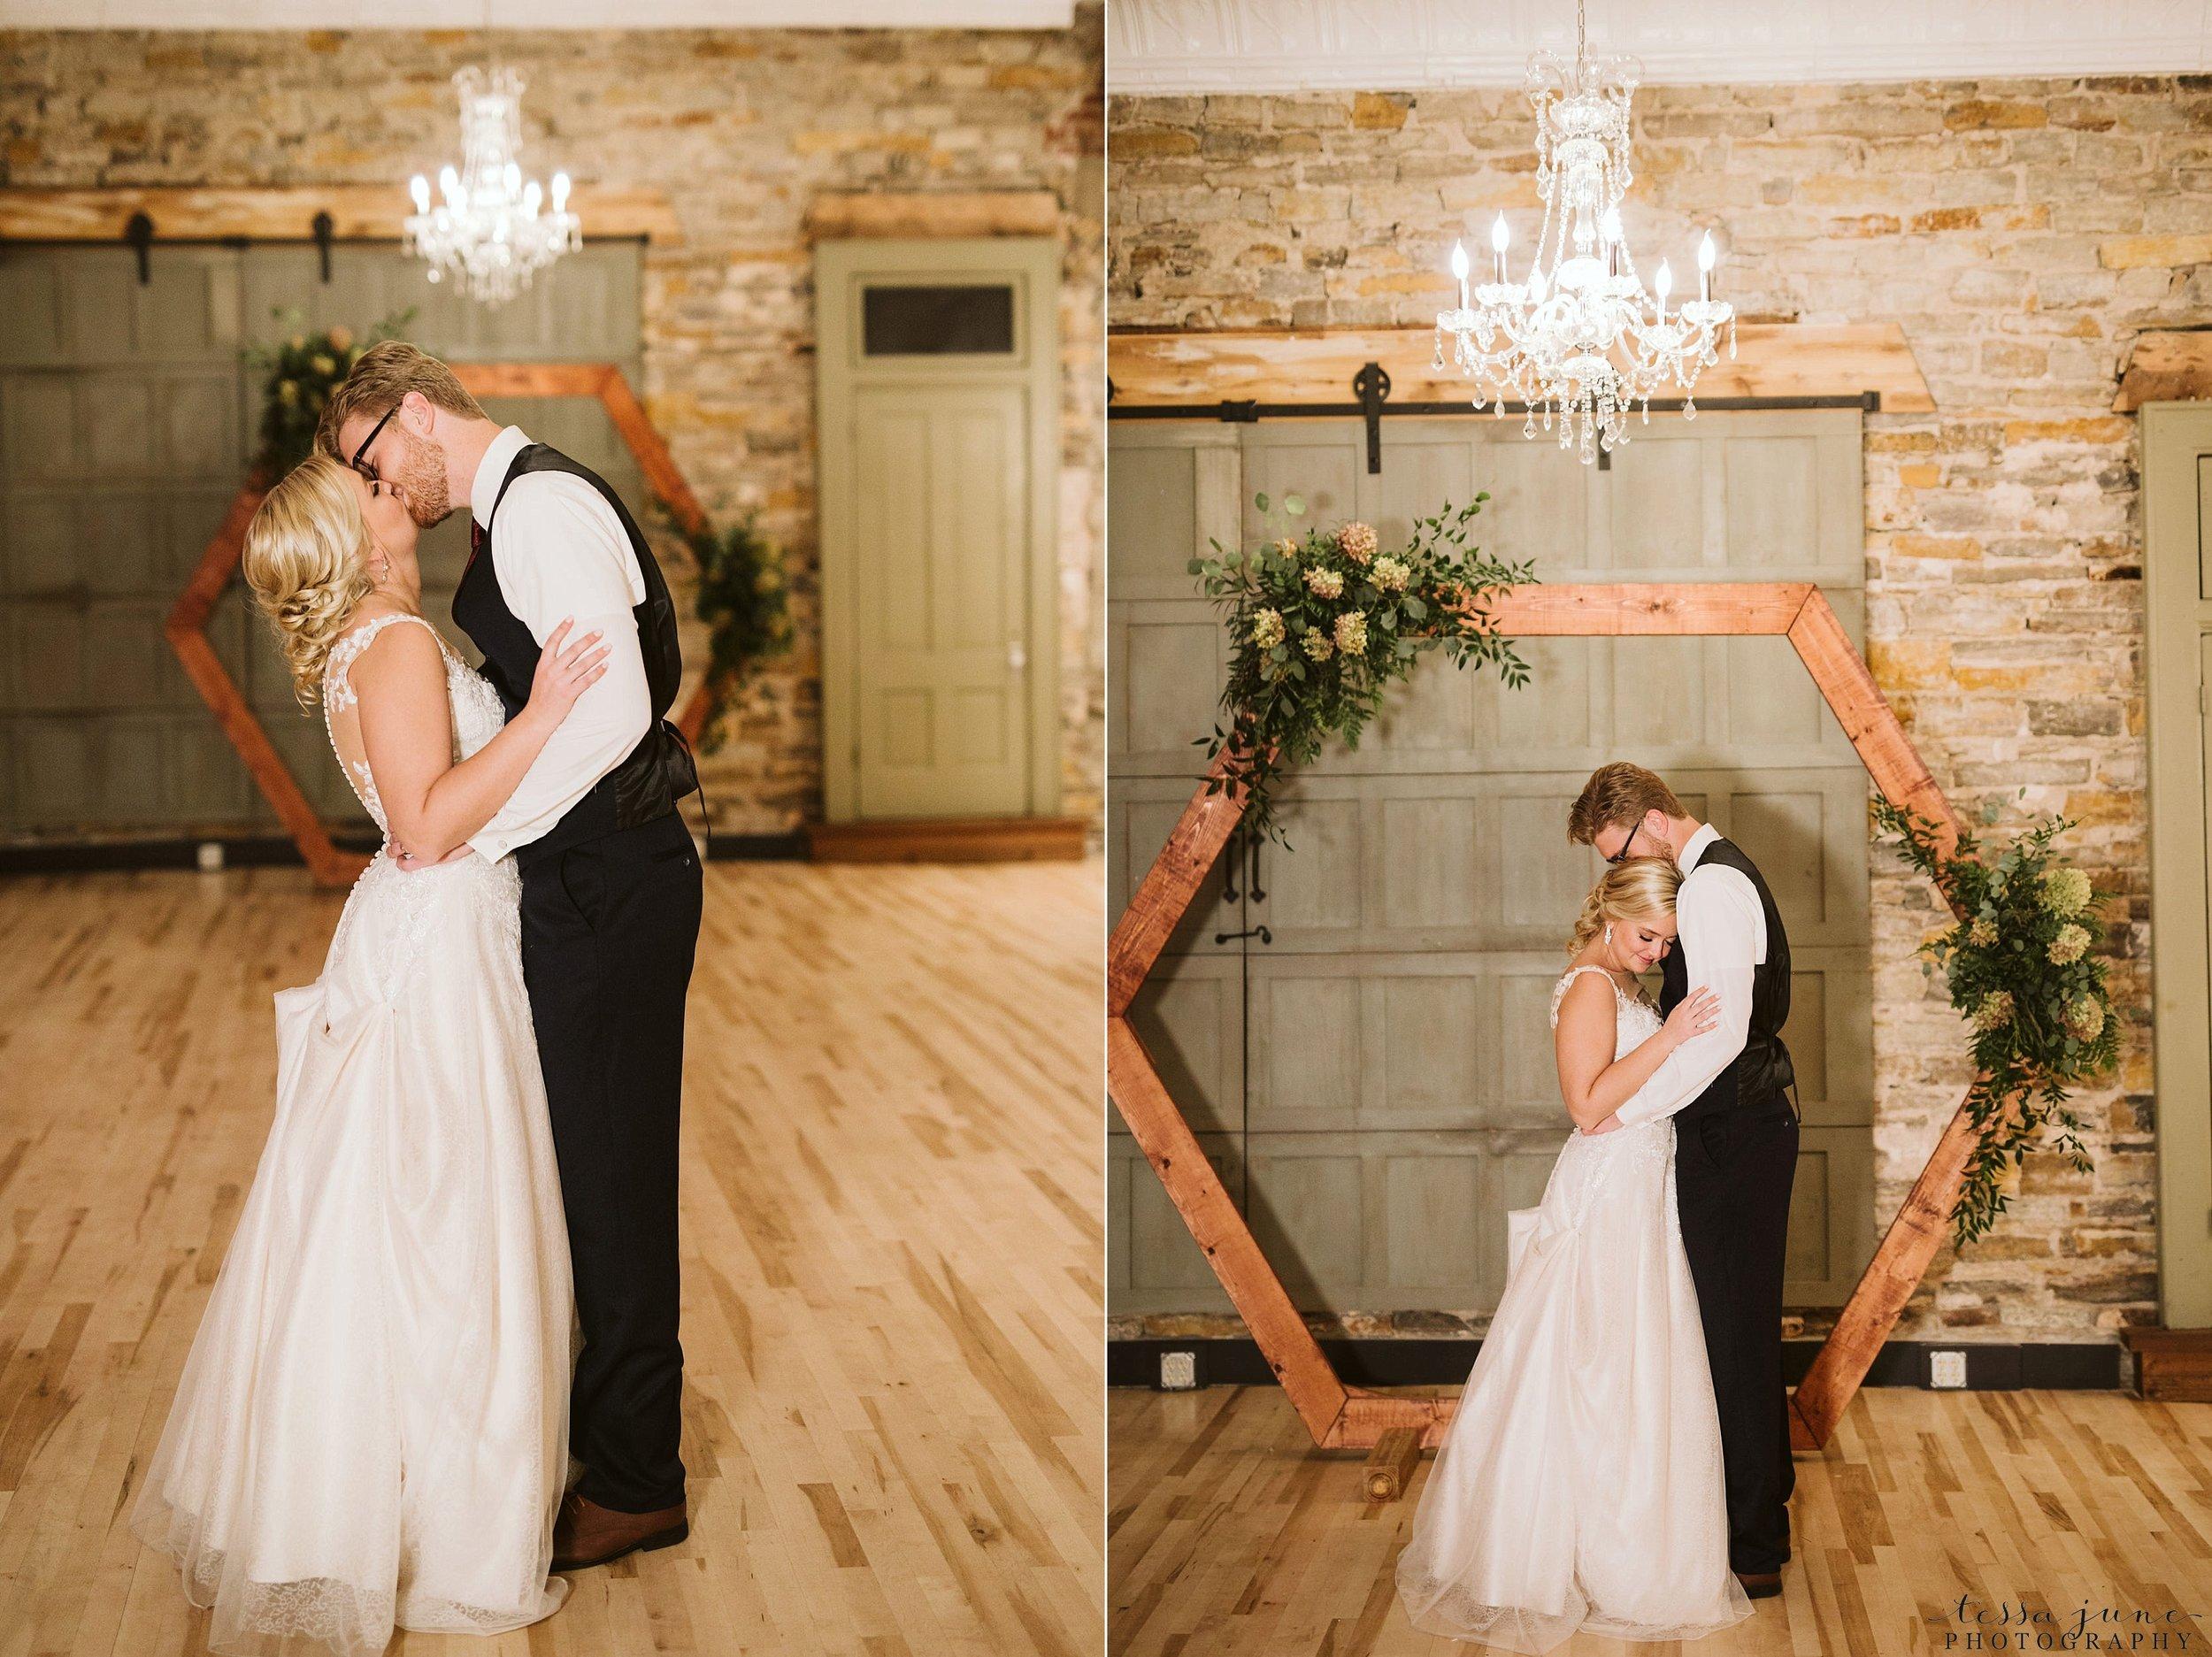 the-3-ten-event-venue-november-elegant-cozy-wedding-faribault-minnesota-75.jpg